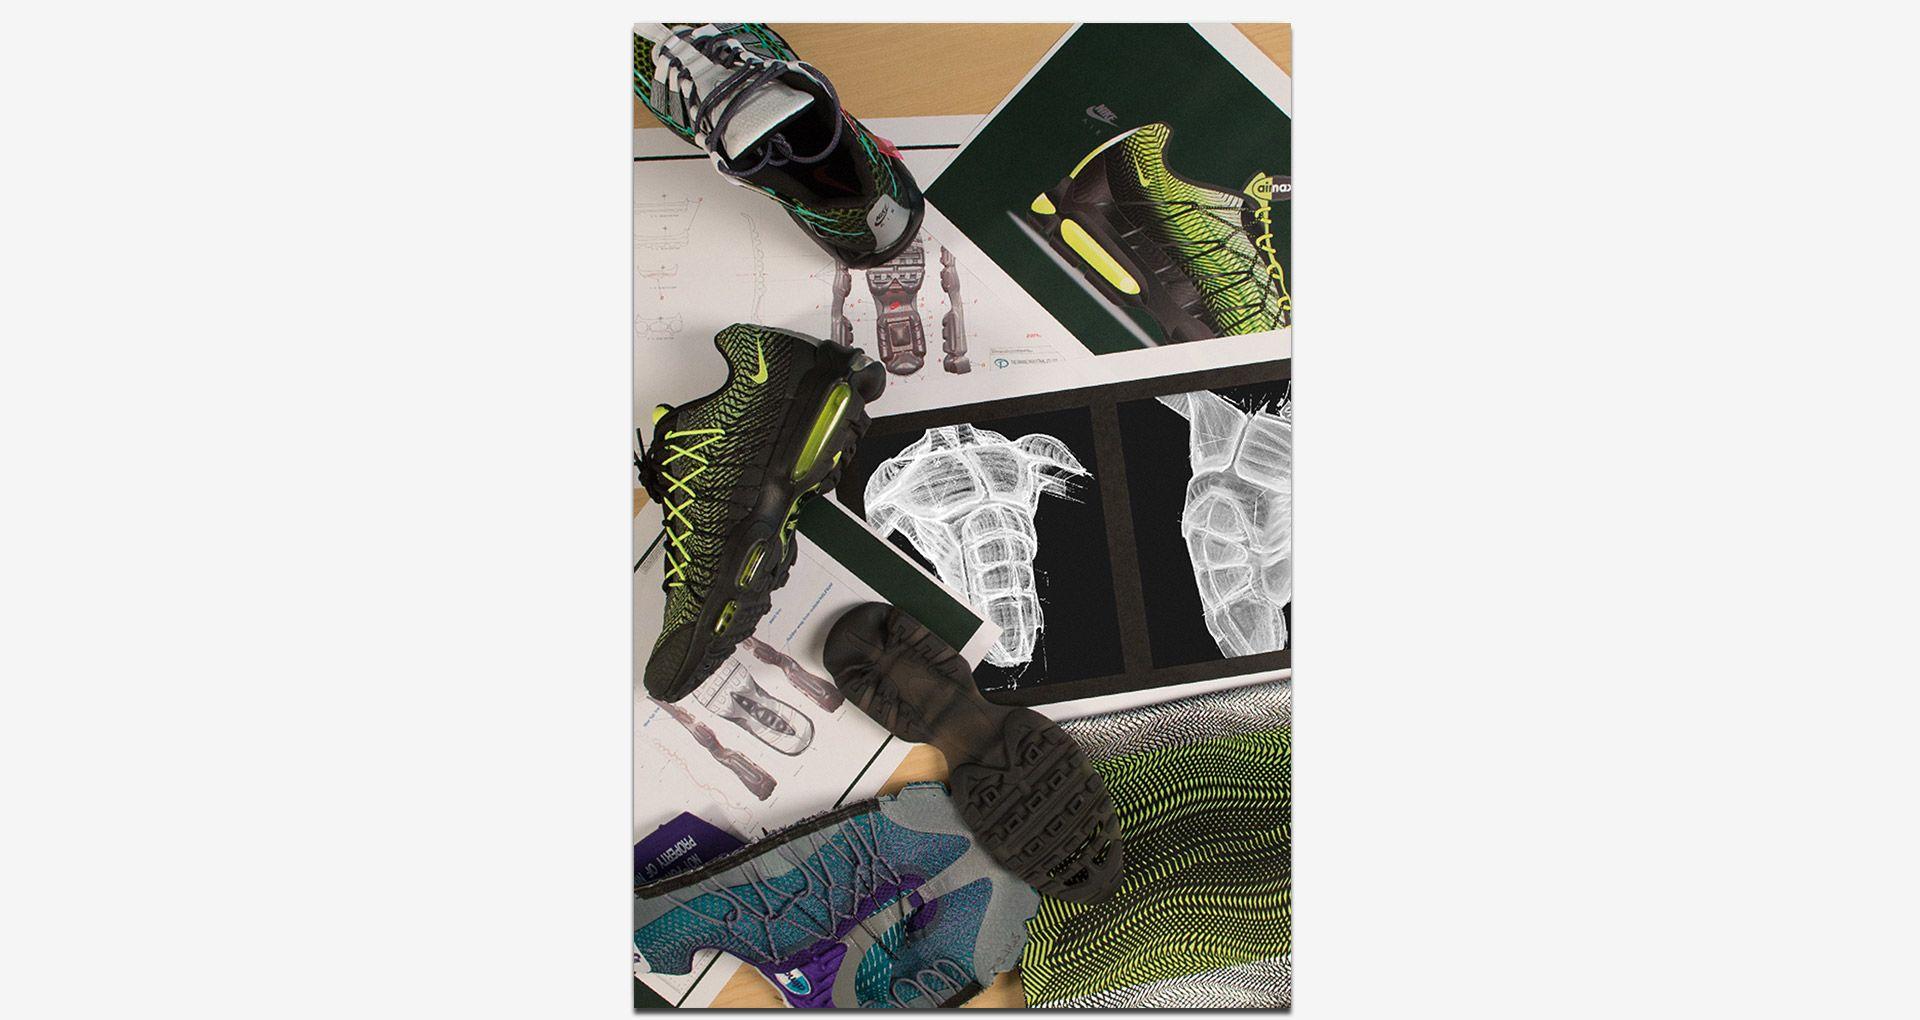 Hinter den Kulissen: Der Nike Air Max 95 Ultra Jacquard